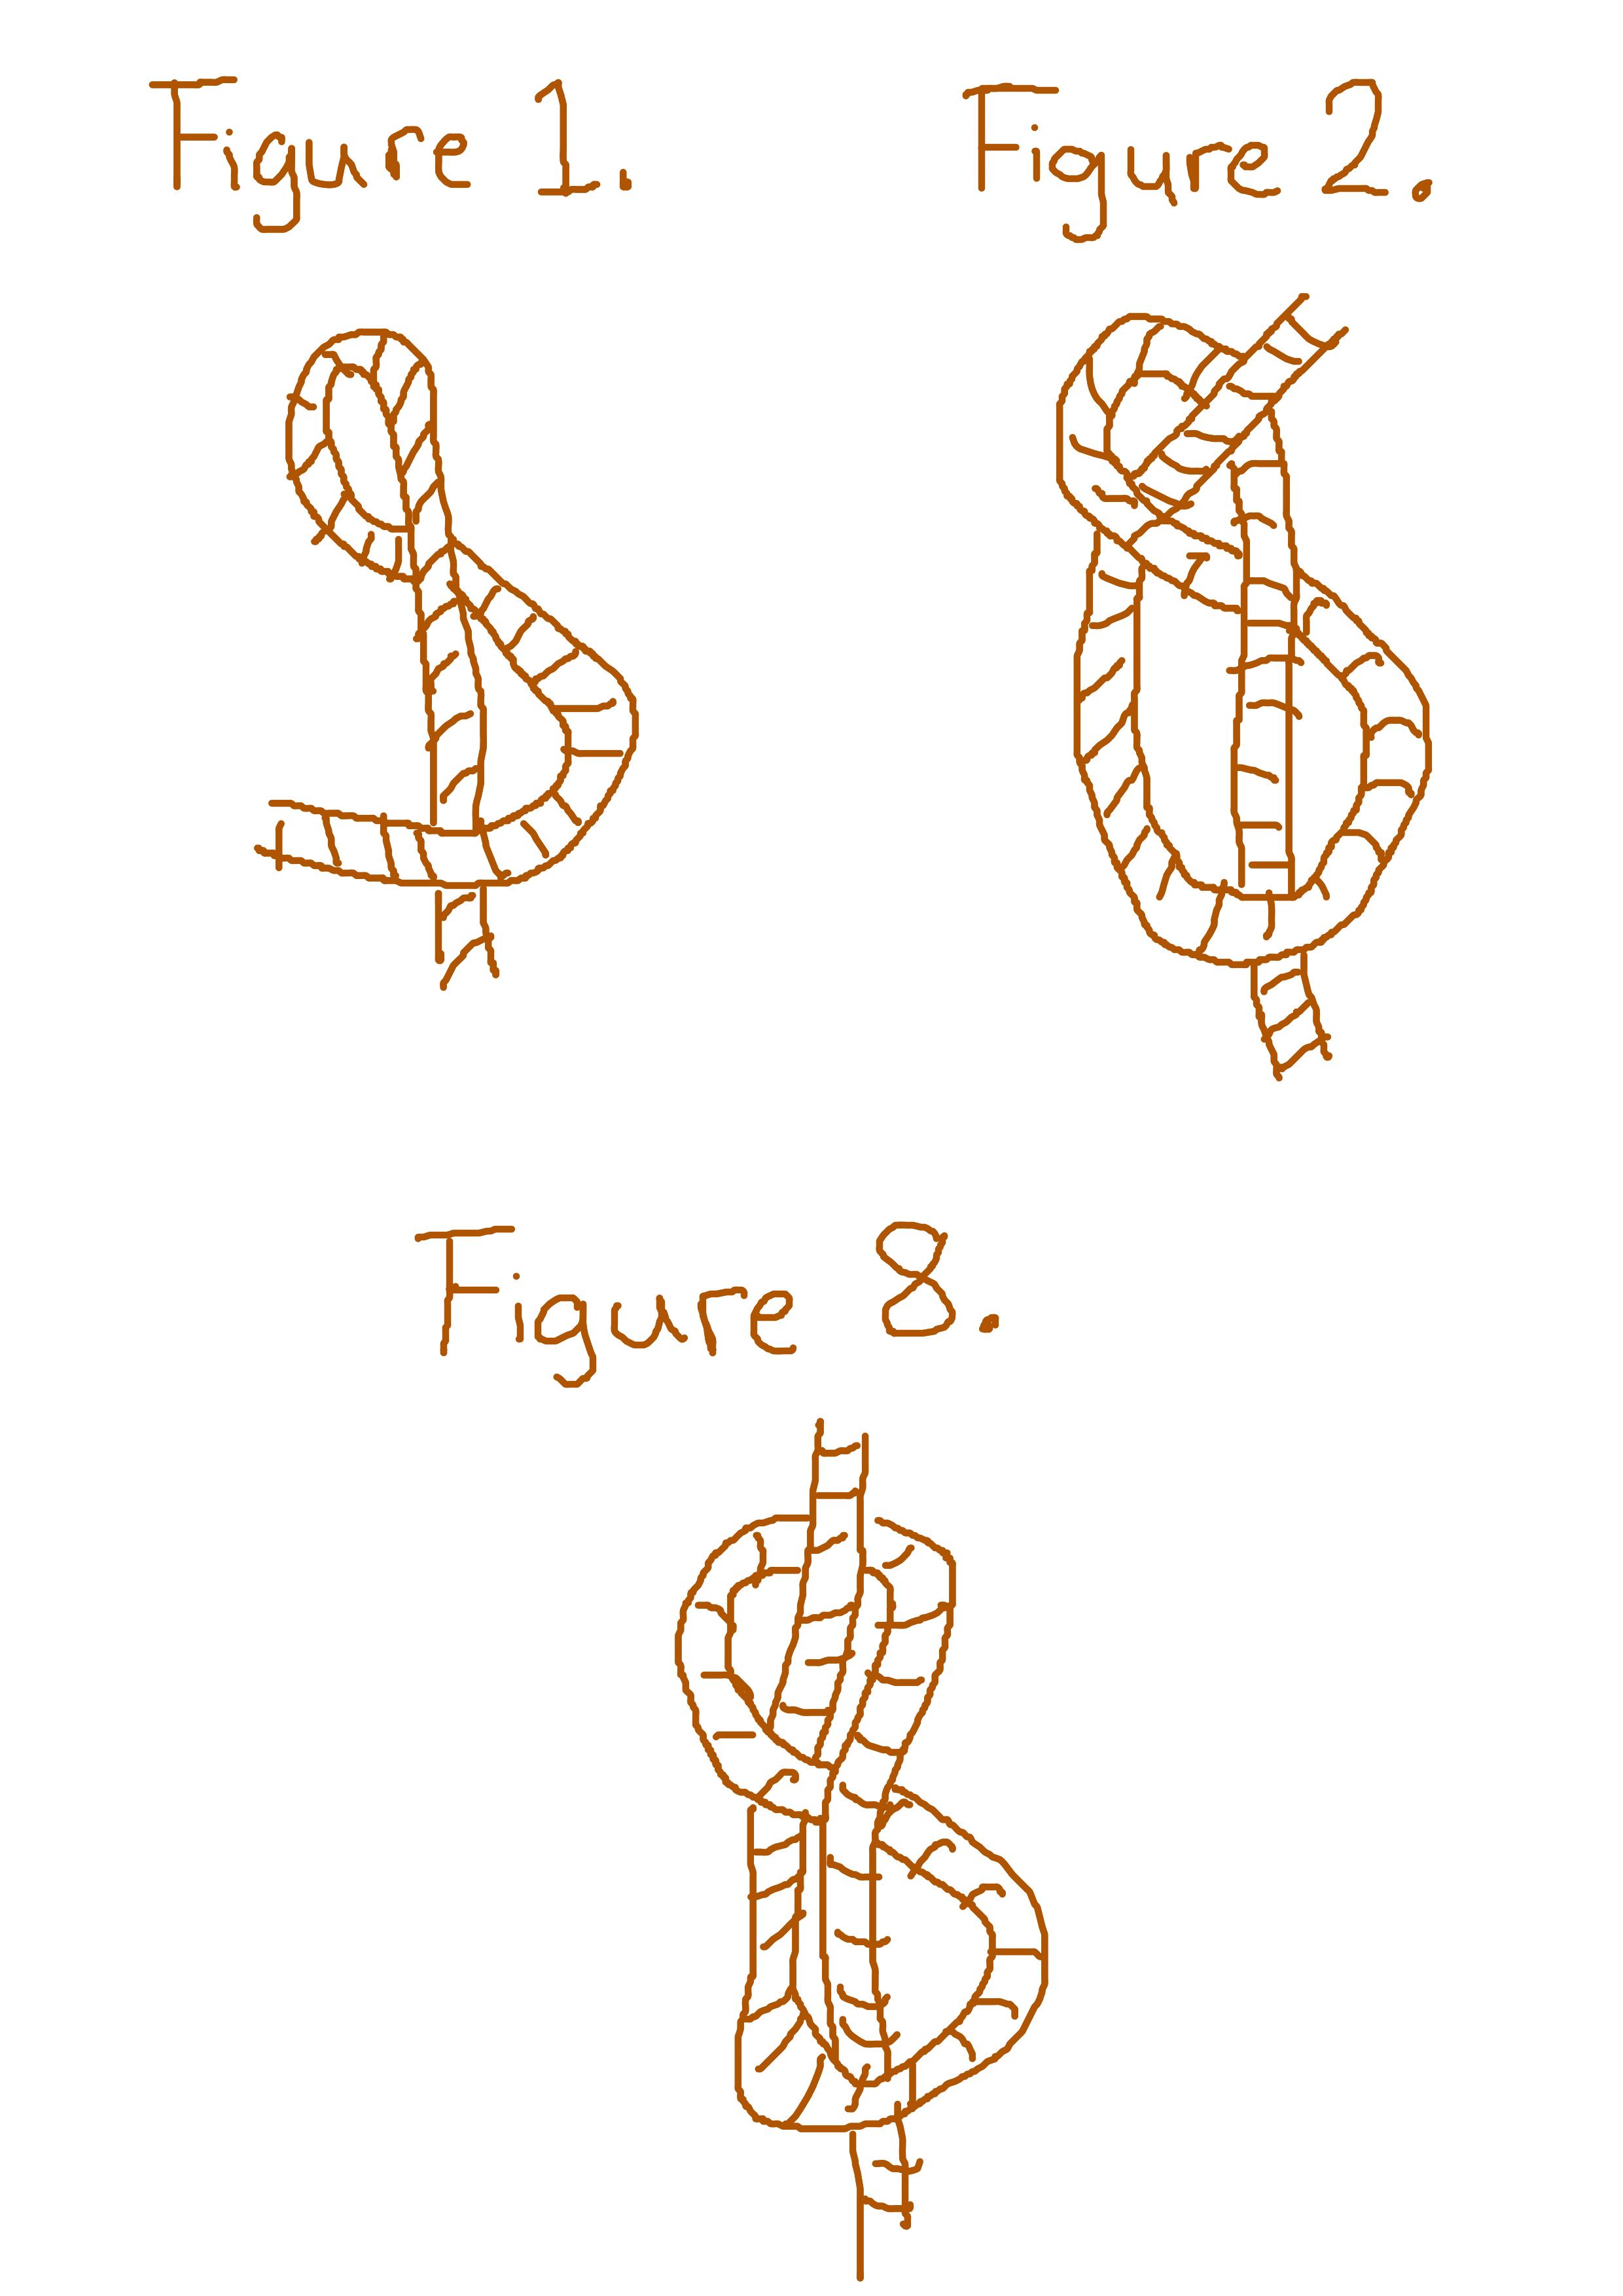 Figures 1 through 8